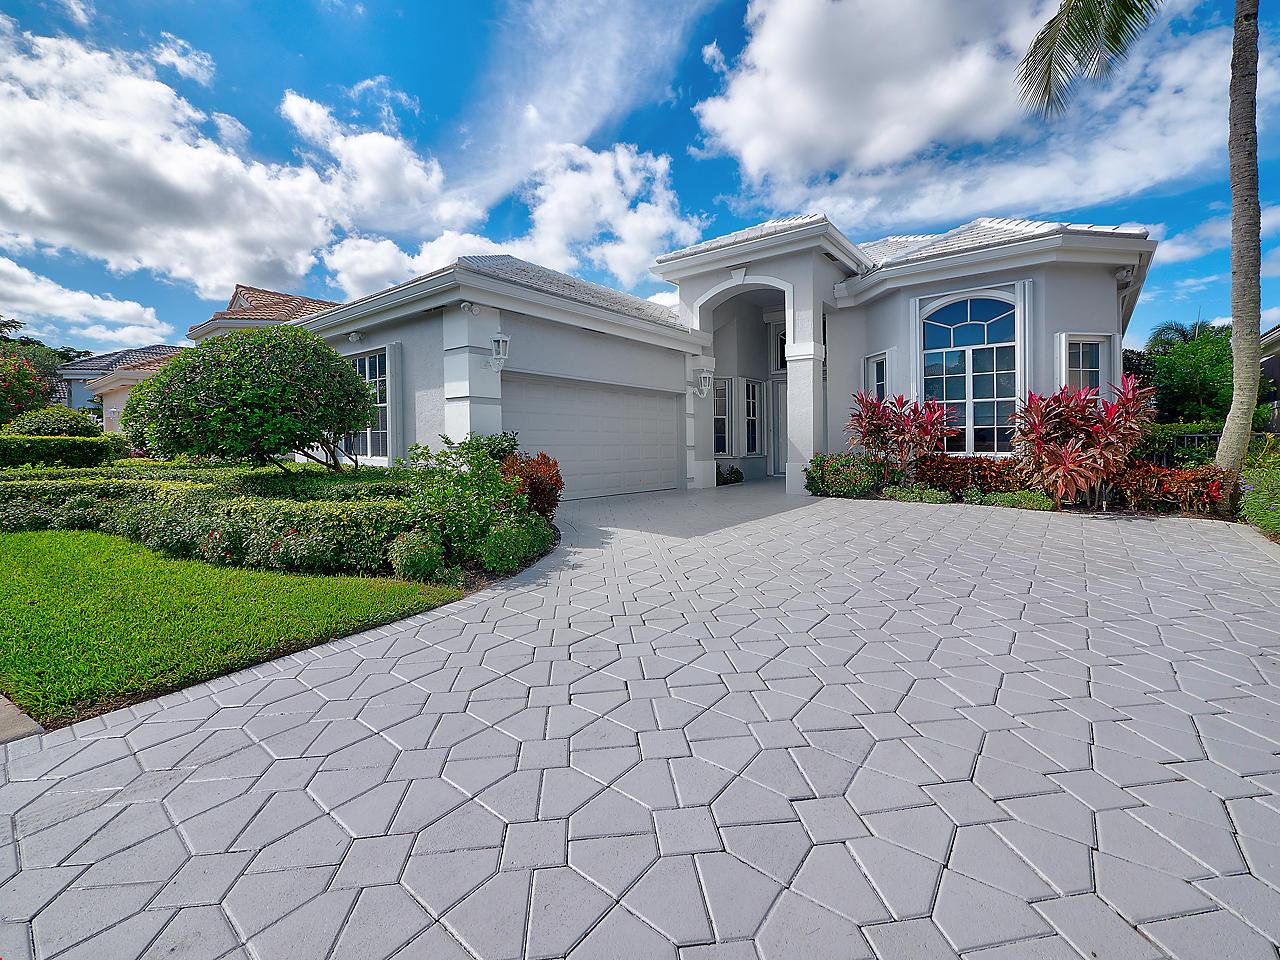 157 Windward Drive, Palm Beach Gardens, Florida 33418, 3 Bedrooms Bedrooms, ,3 BathroomsBathrooms,A,Single family,Windward,RX-10567711